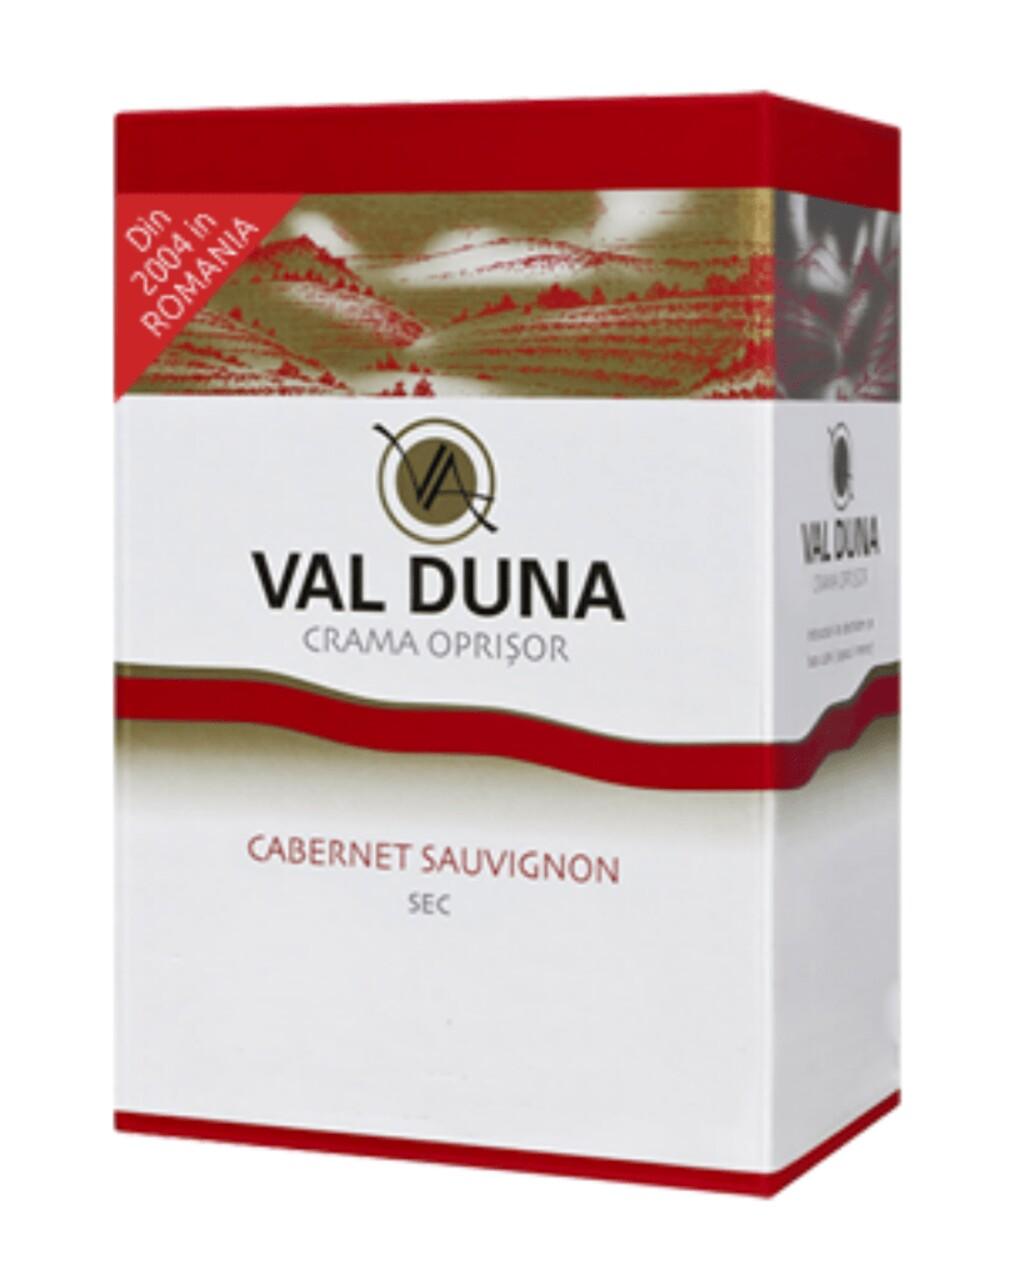 Oprisor Val Duna Cabernet Sauvignon BIB 3L